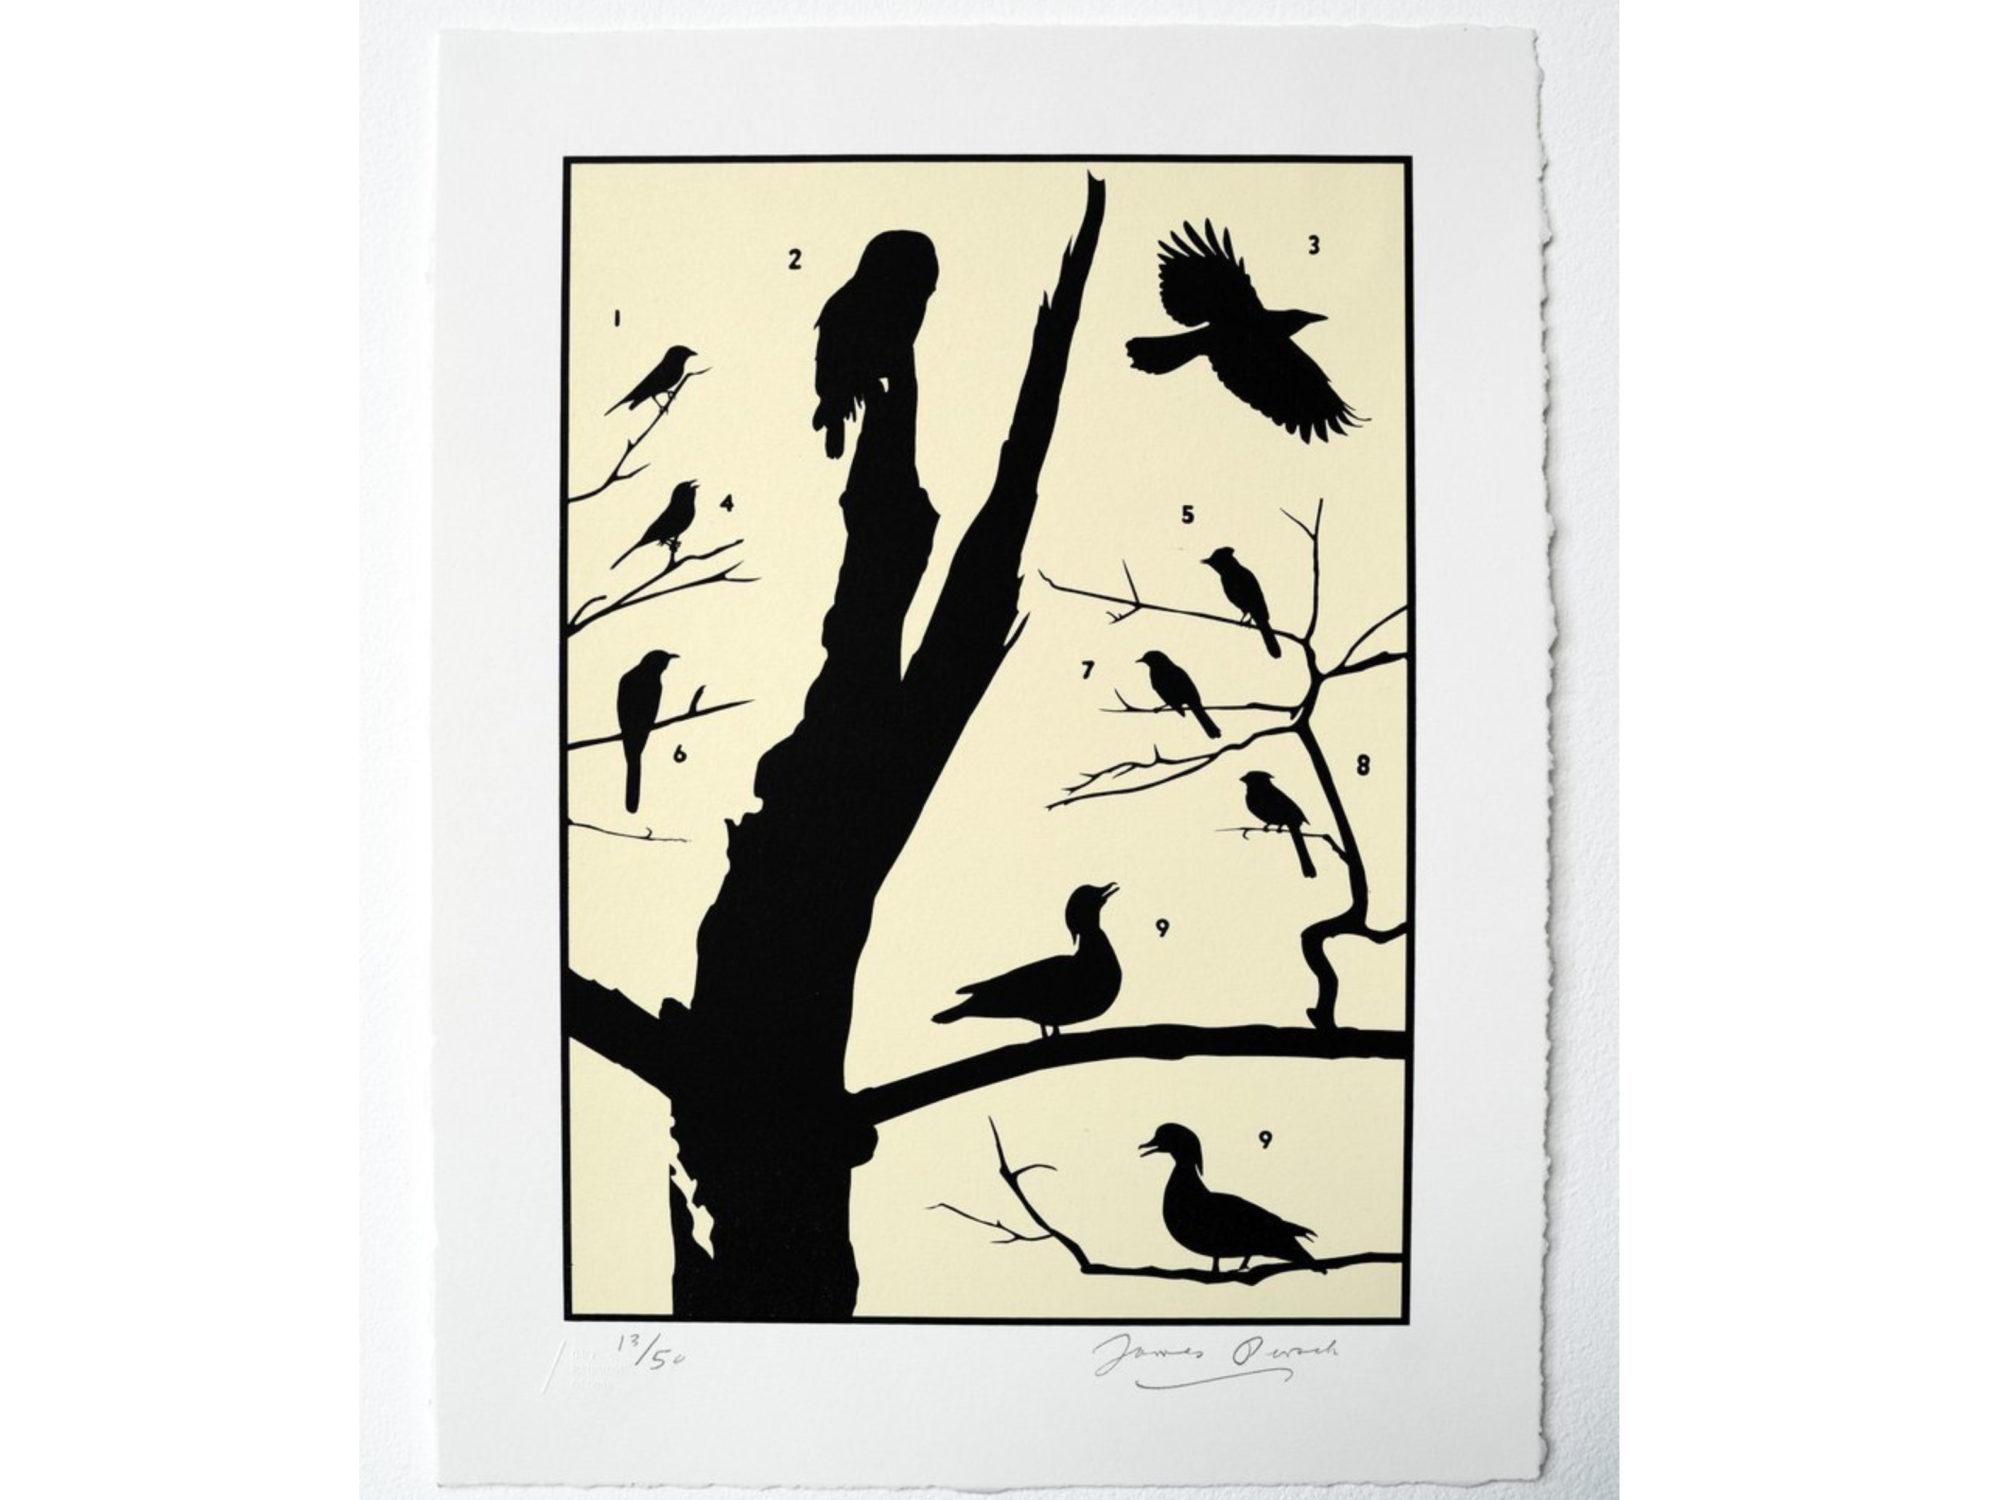 Print of silhouette birds